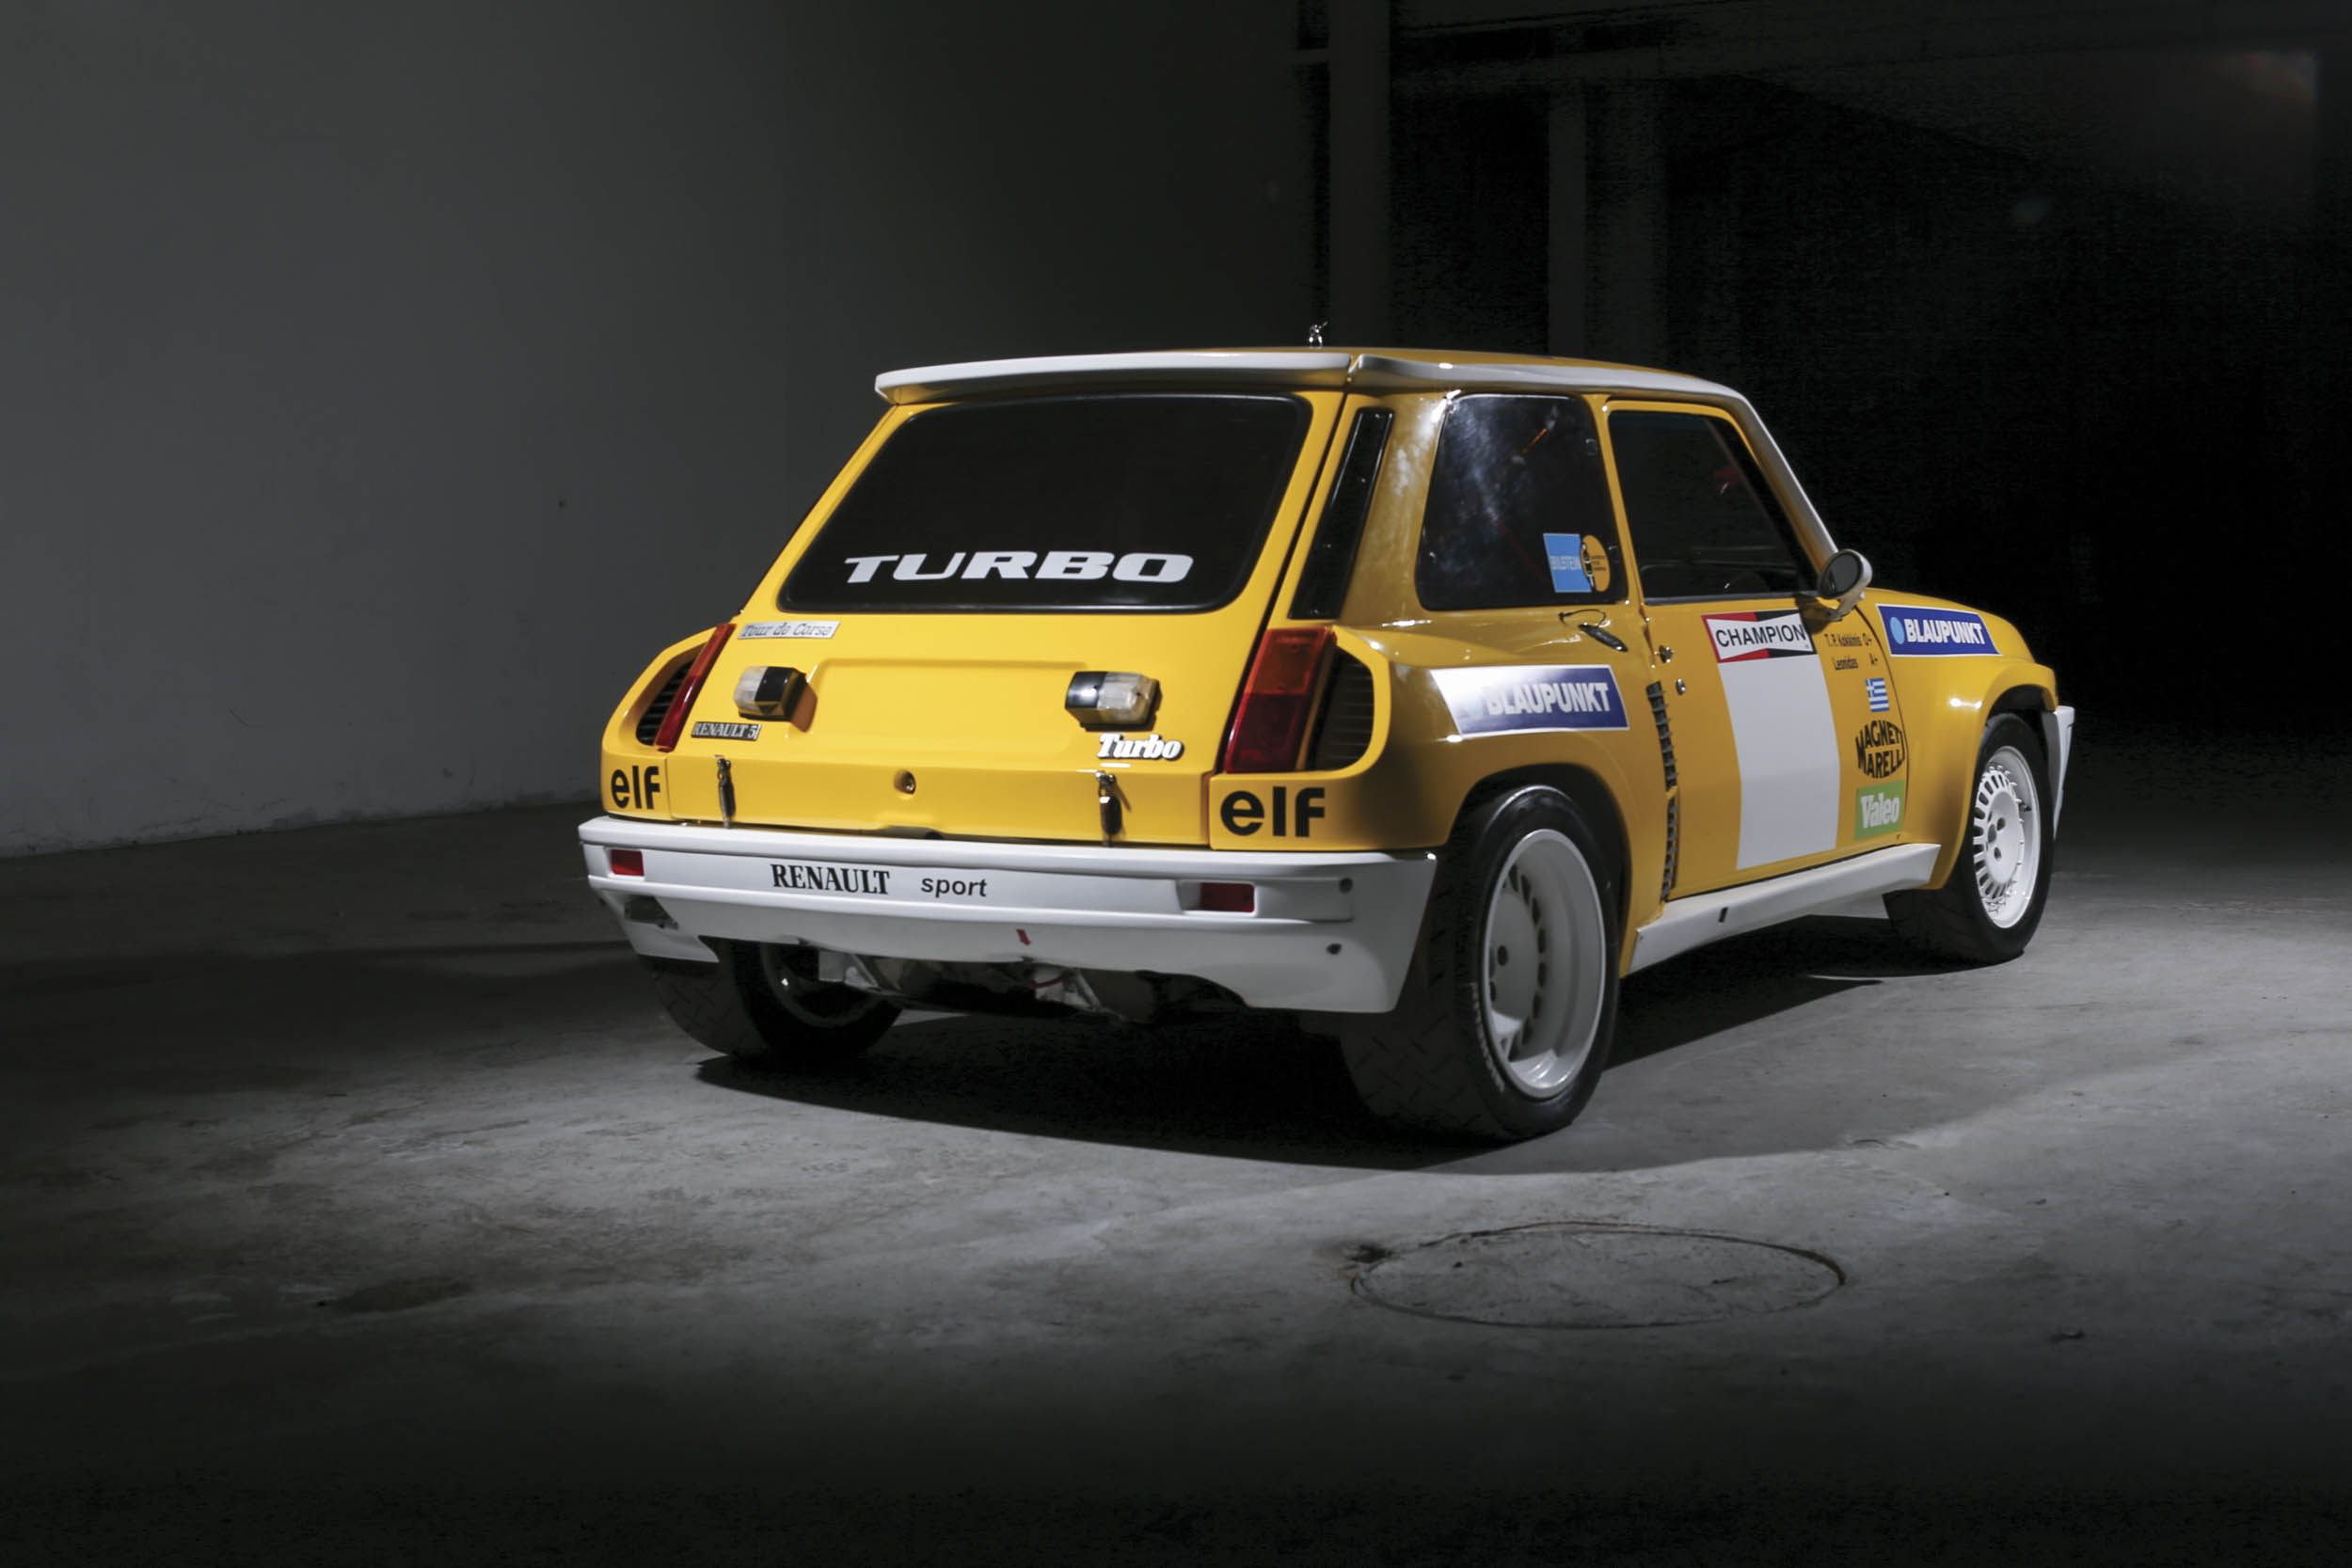 1980 Renault 5 Turbo rear 3/4